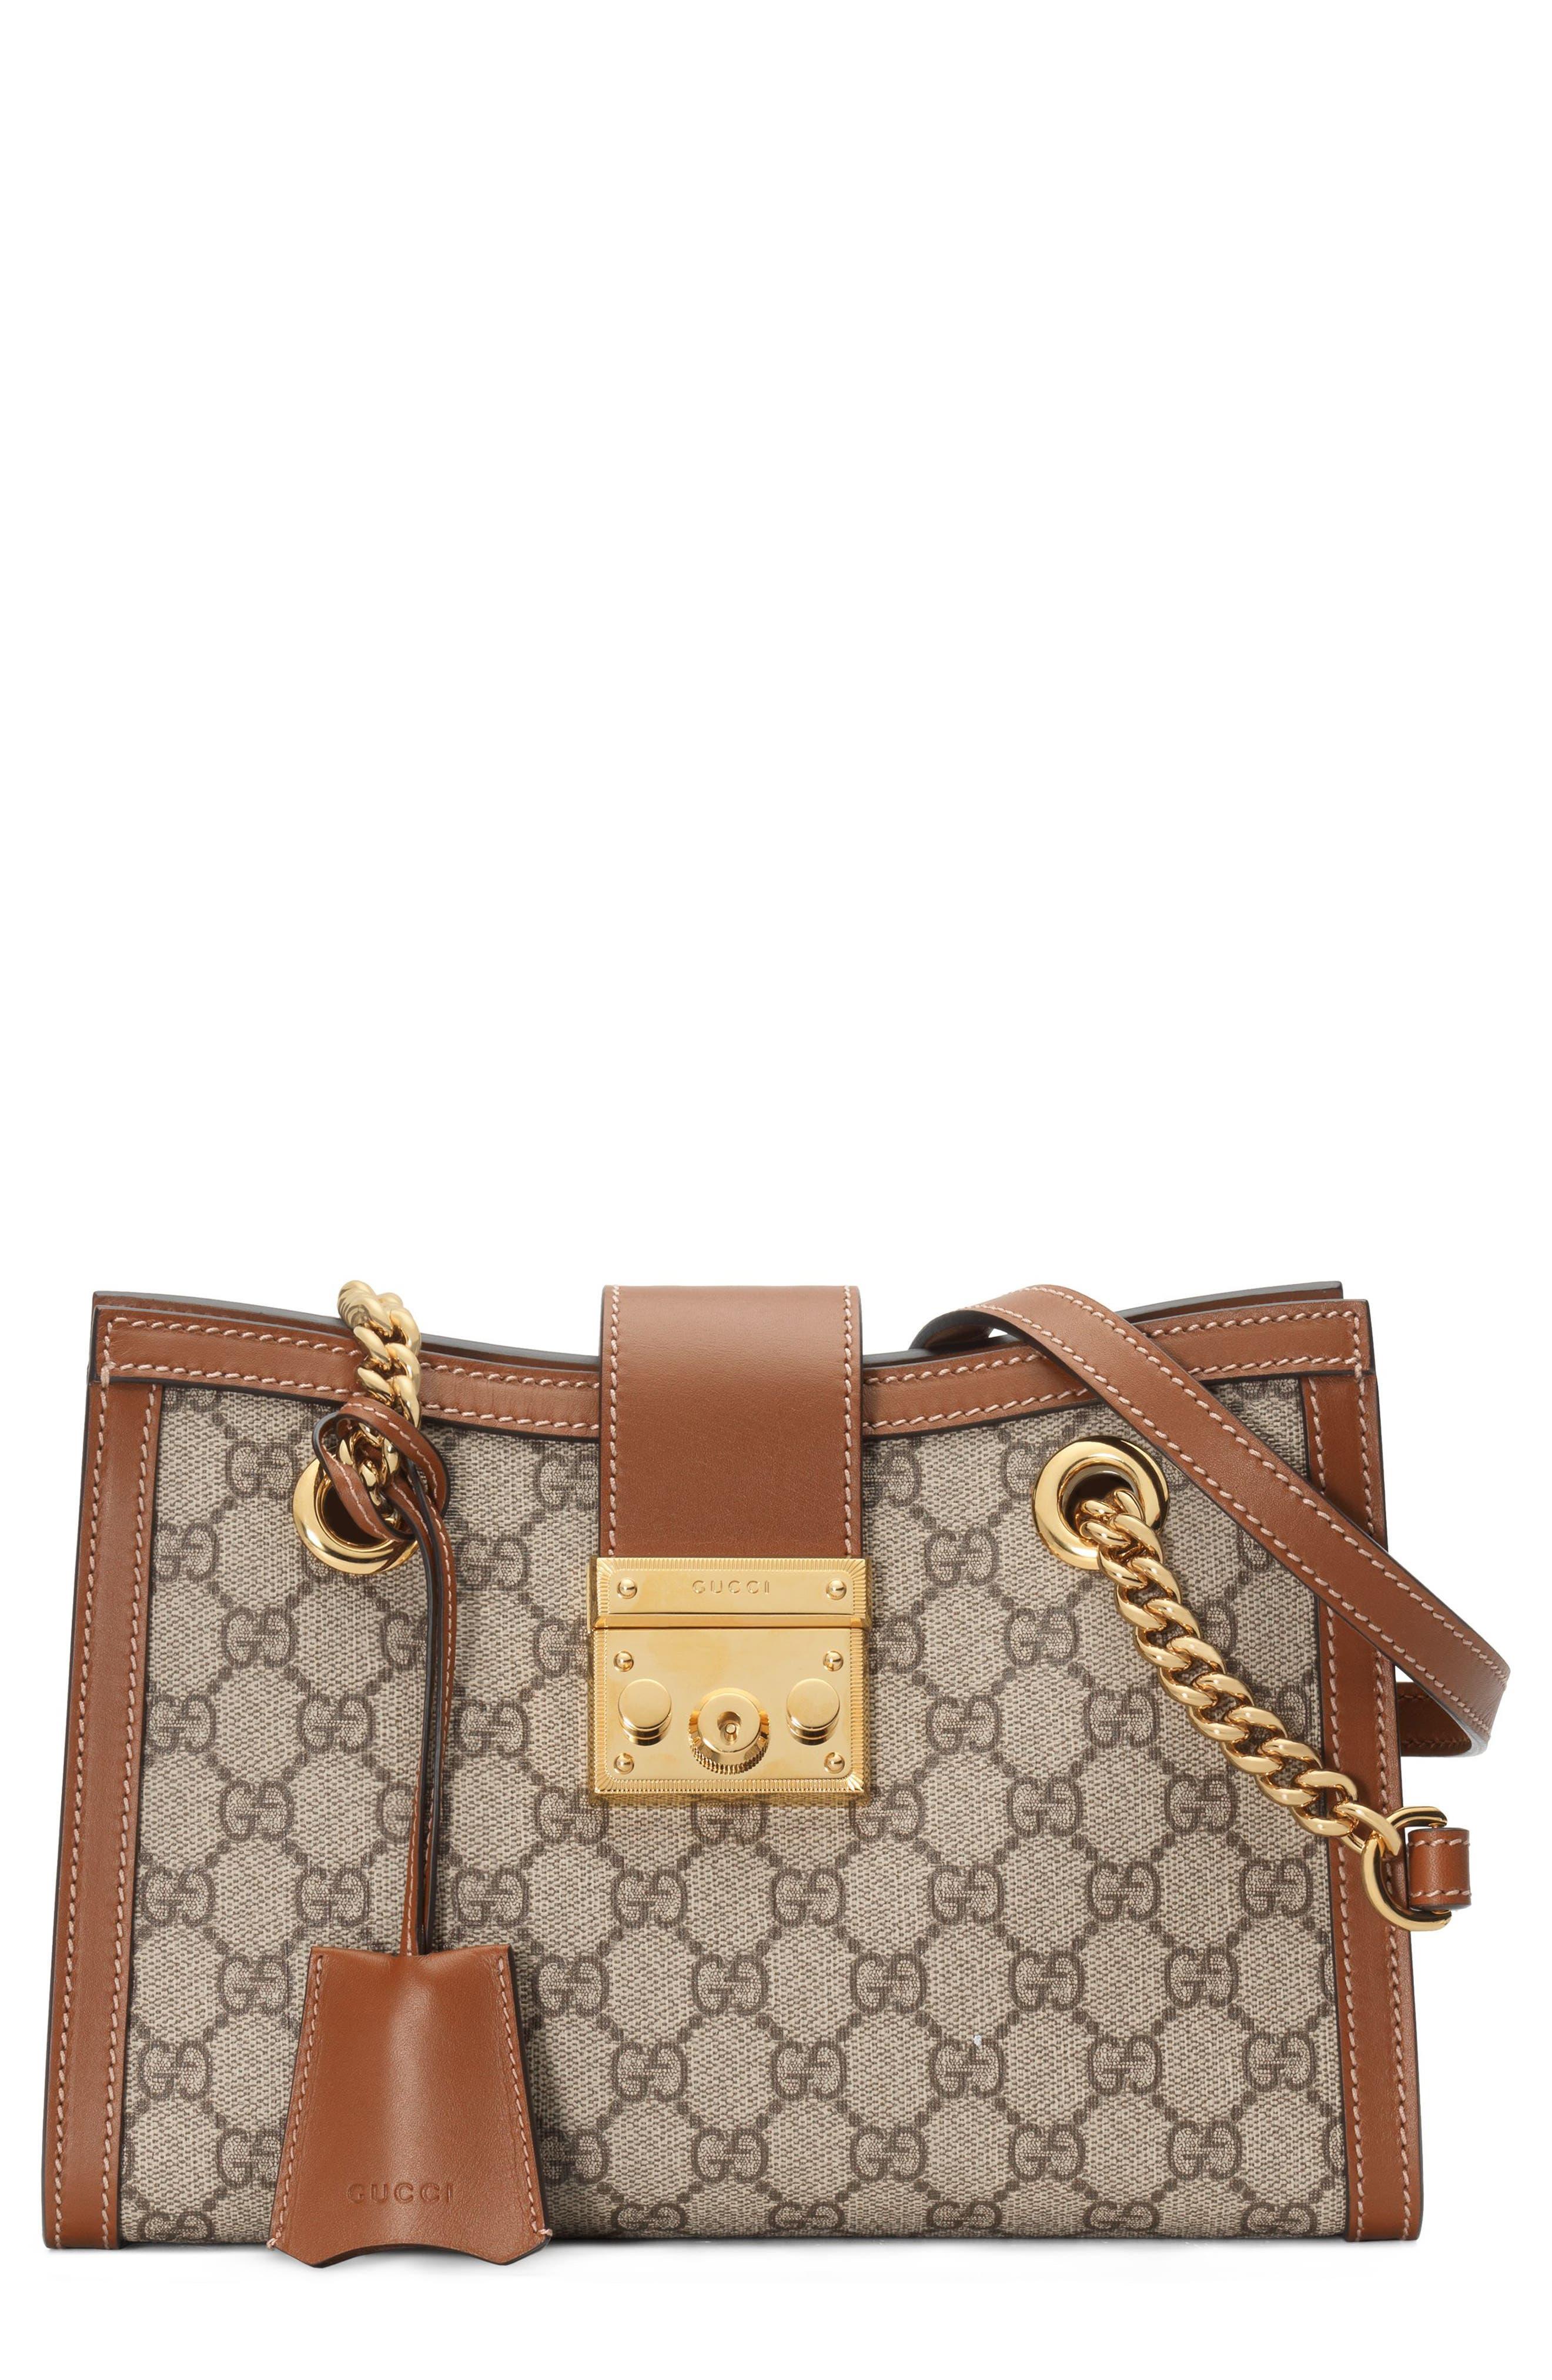 Small Padlock GG Supreme Shoulder Bag,                         Main,                         color, Beige Ebony/ Tuscany